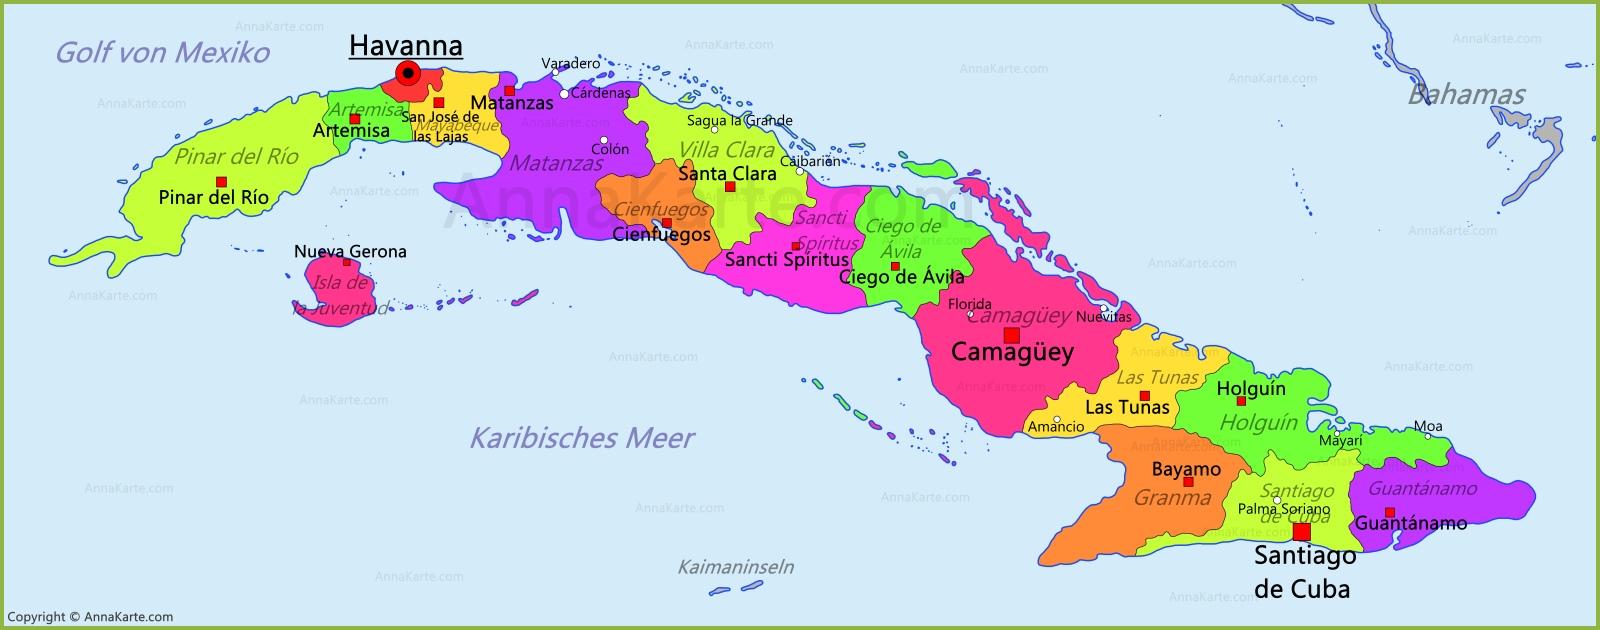 Havanna Kuba Karte.Kuba Karte Annakarte Com